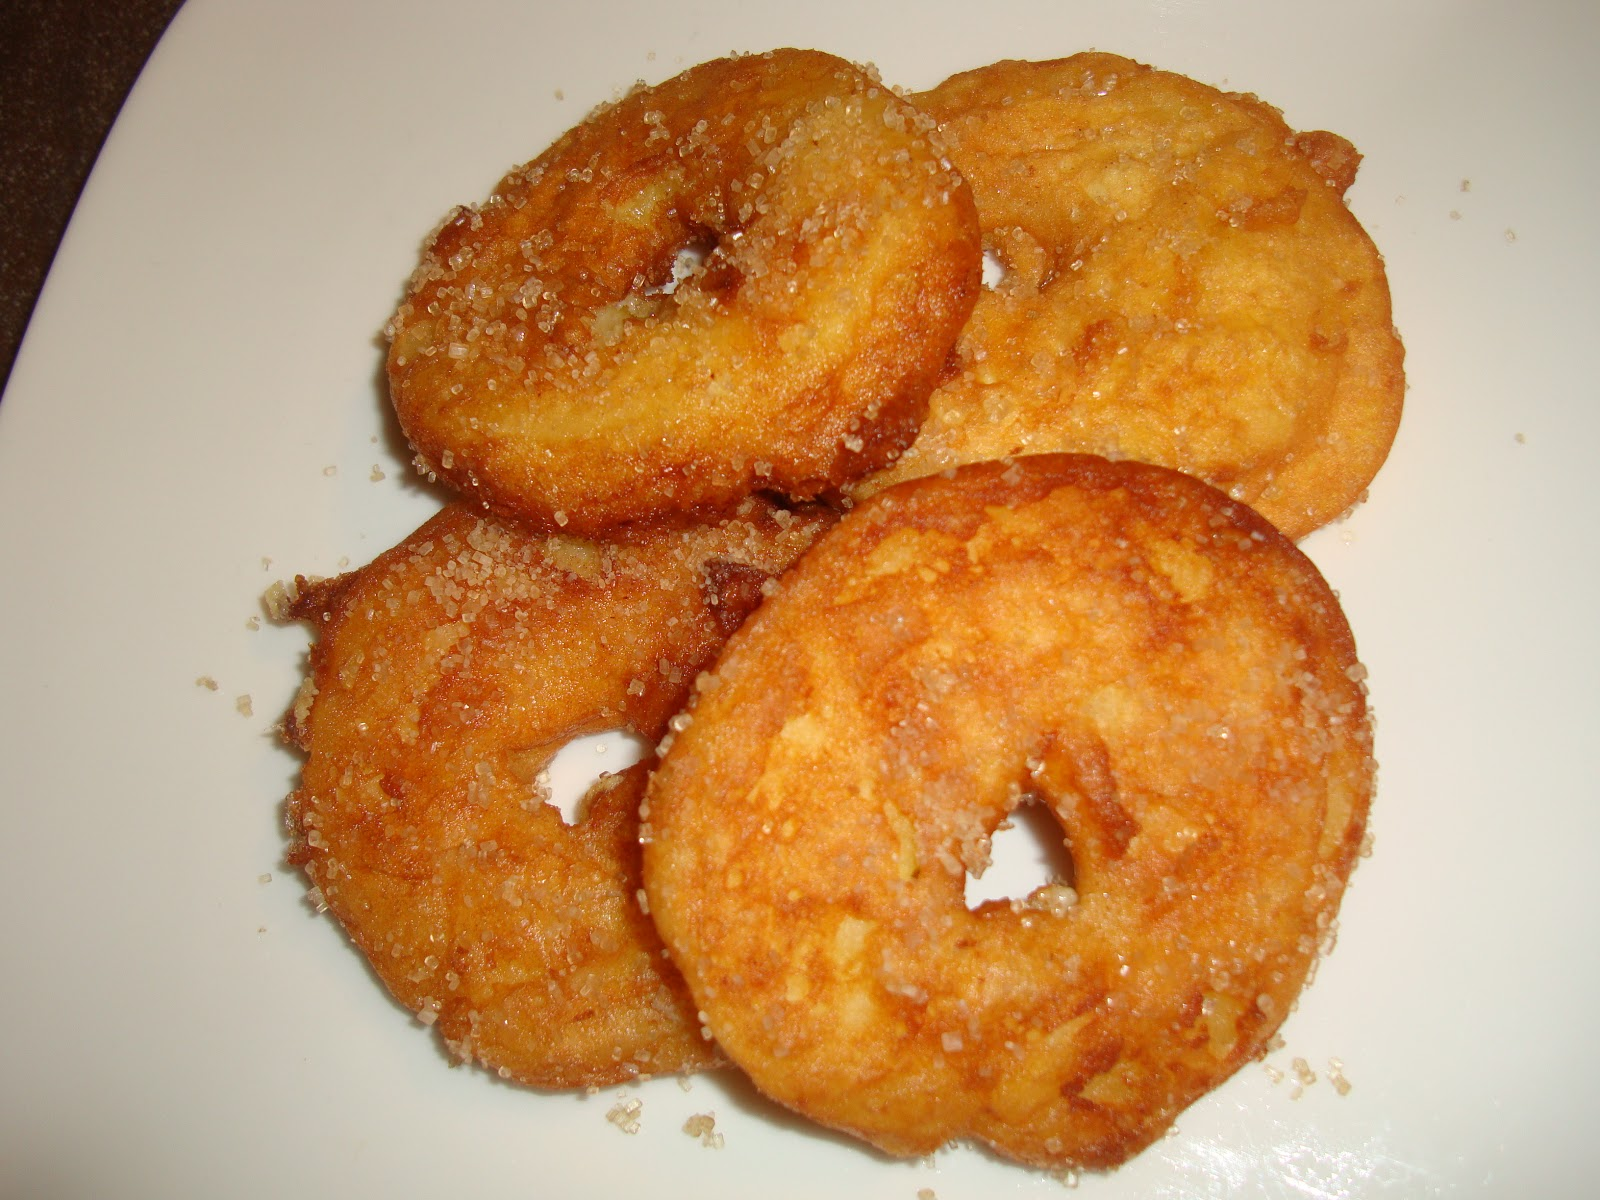 Jood's Mix: Aepfelchuechli (deep fried apple rings)